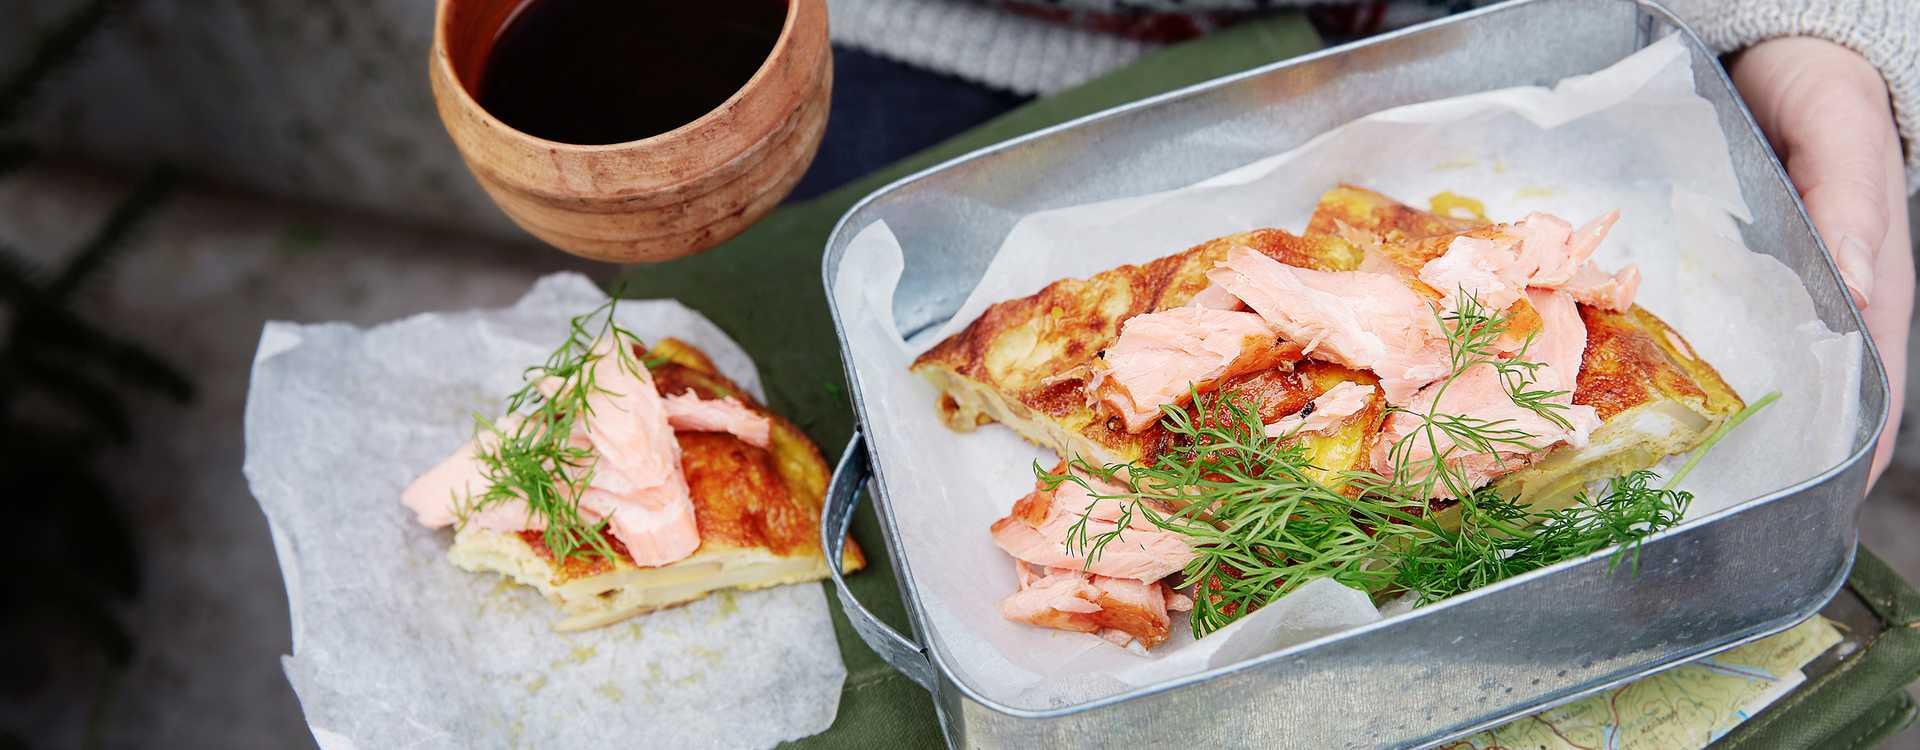 Potettortilla med varmrøkt laks og dill